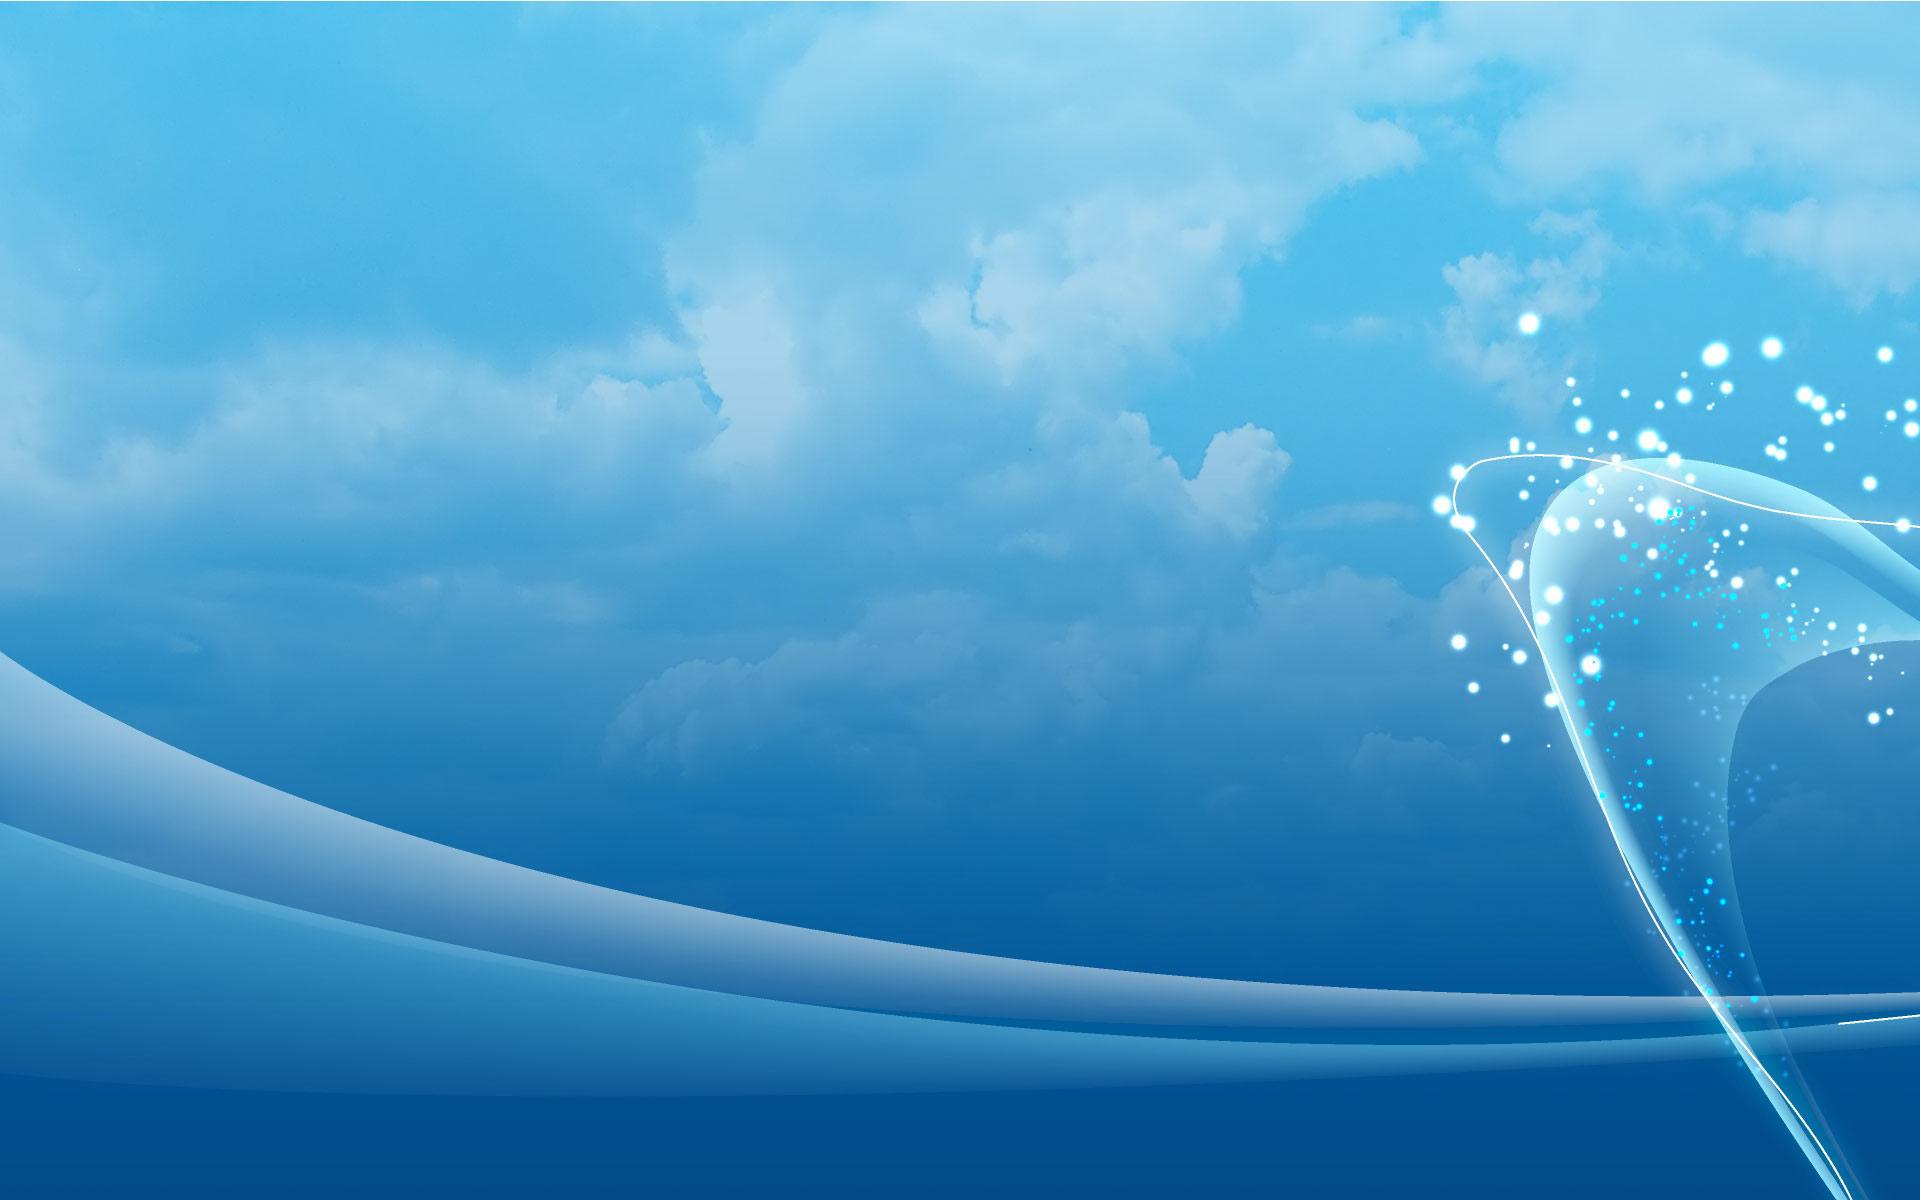 sky blue 22 wallpaper background hd 1jpg   Tyee Windows 1920x1200